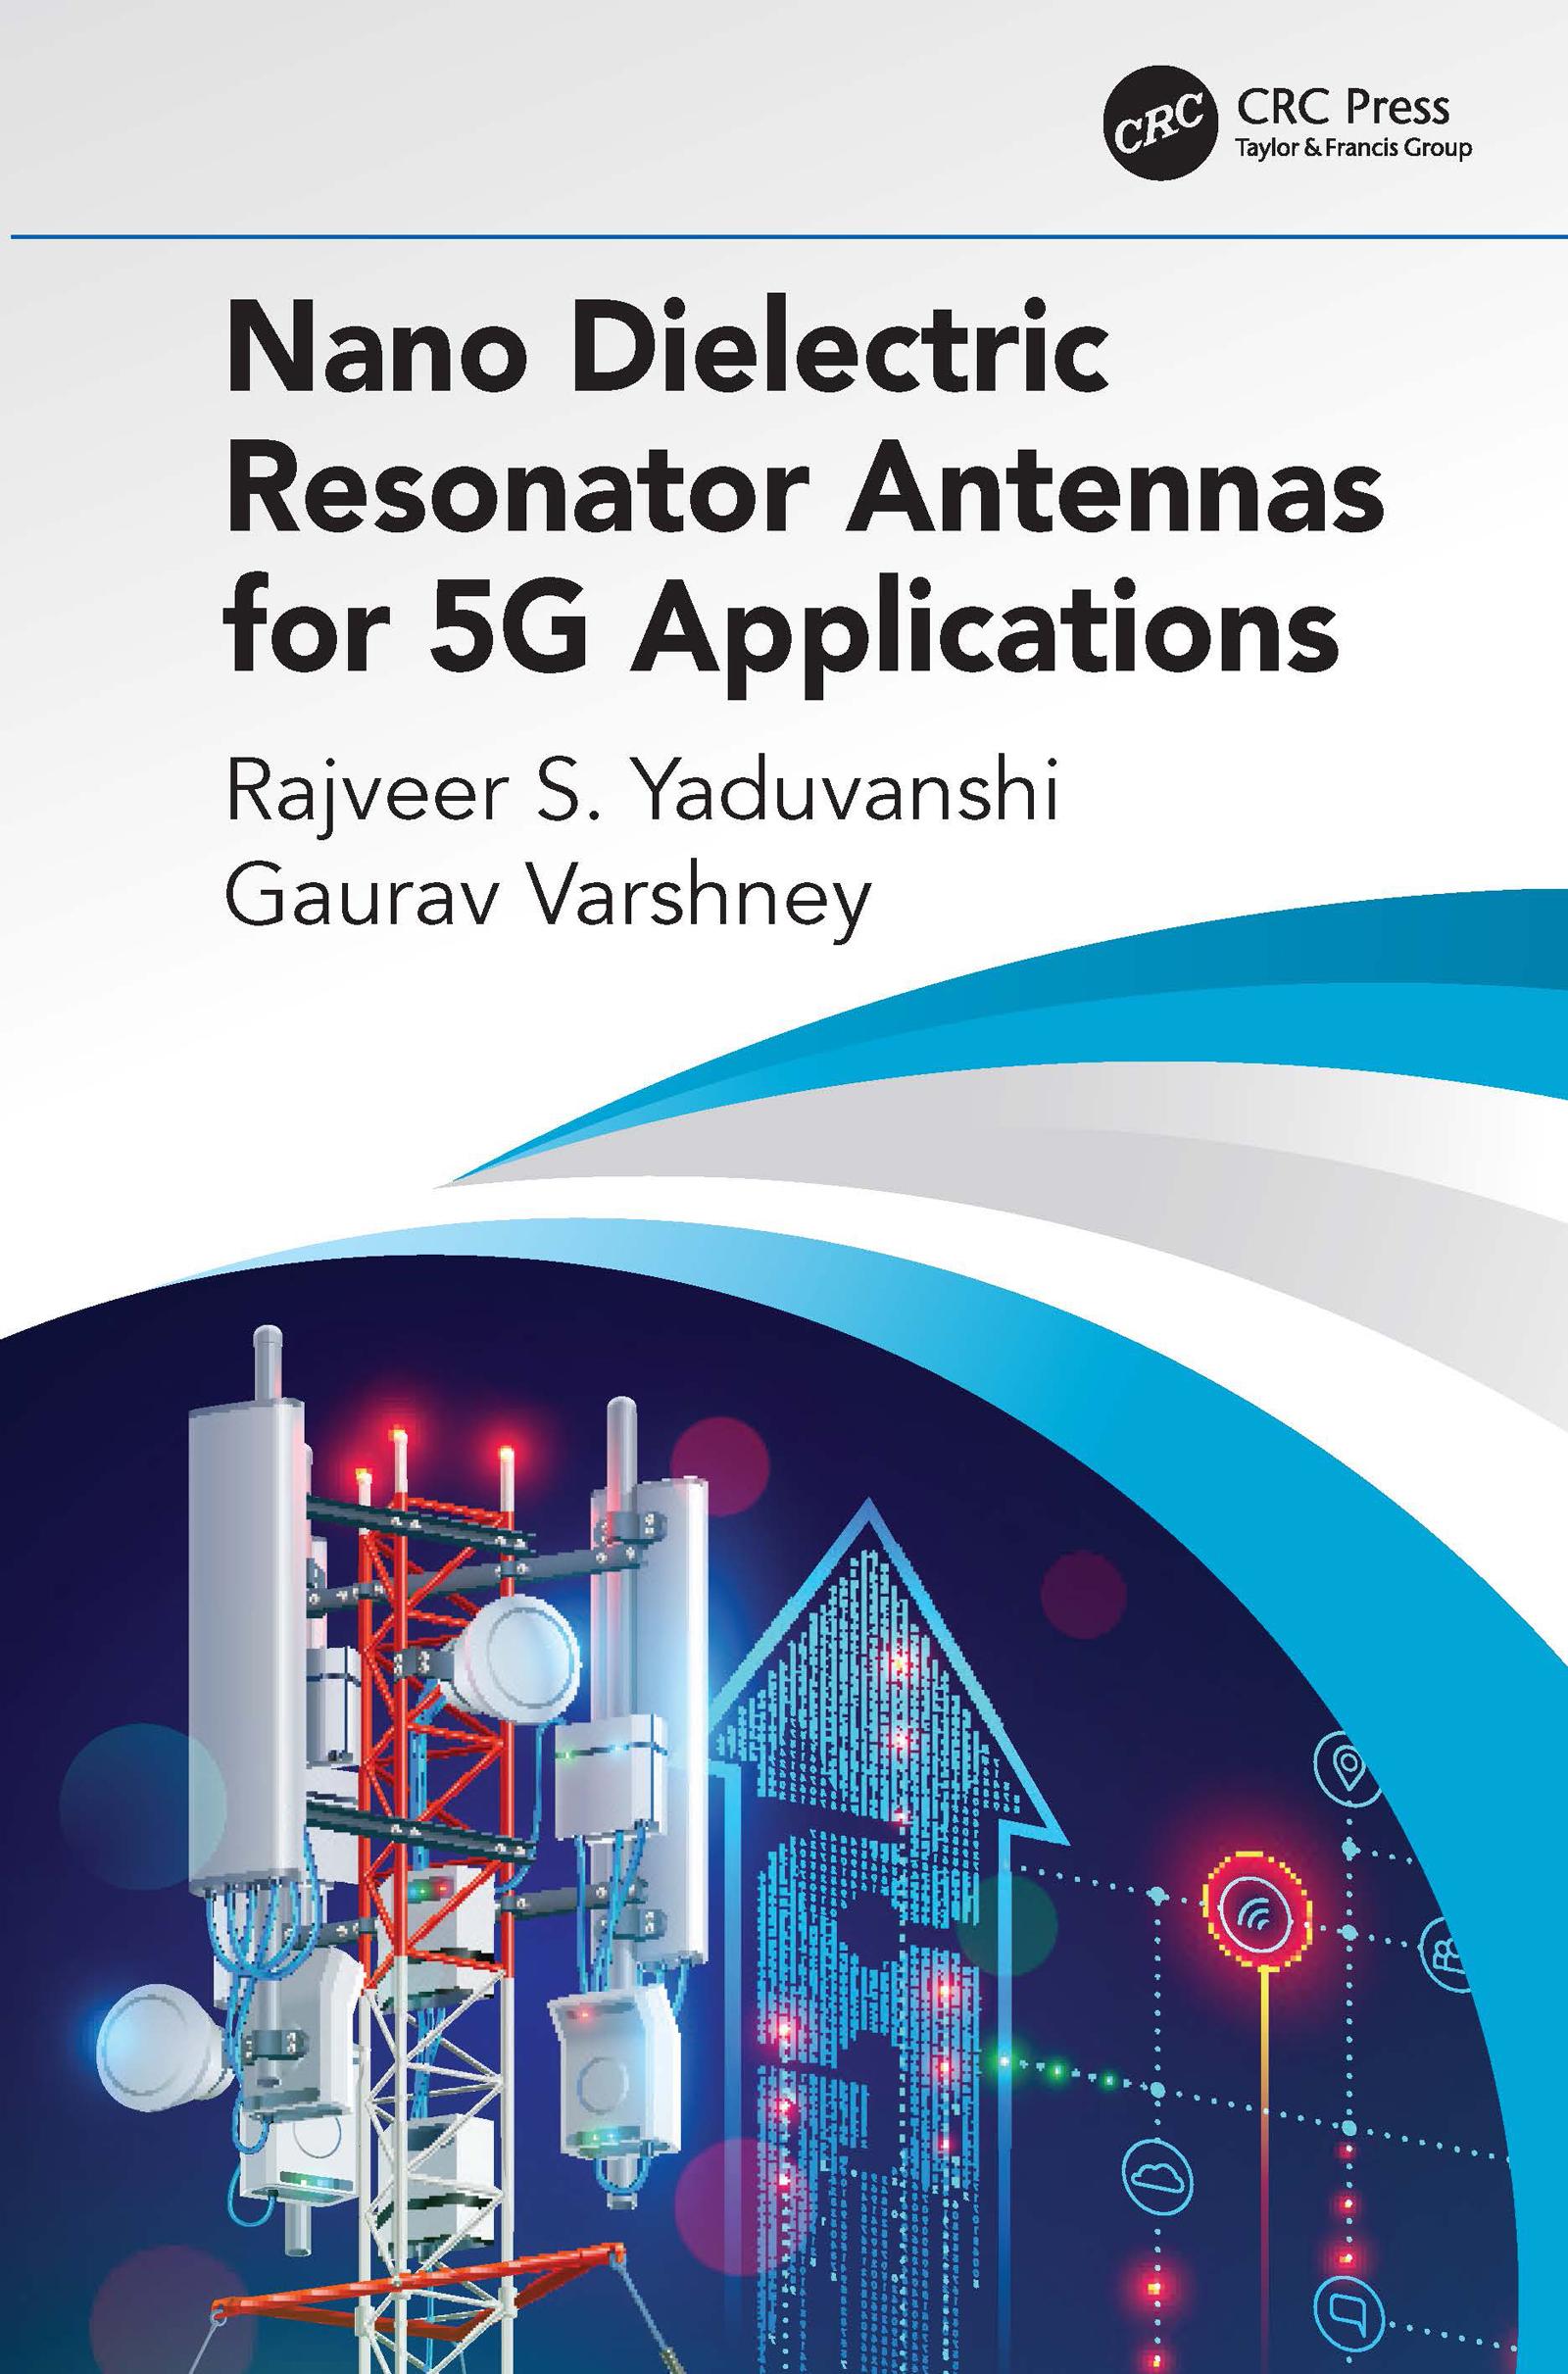 Nano Dielectric Resonator Antennas for 5G Applications